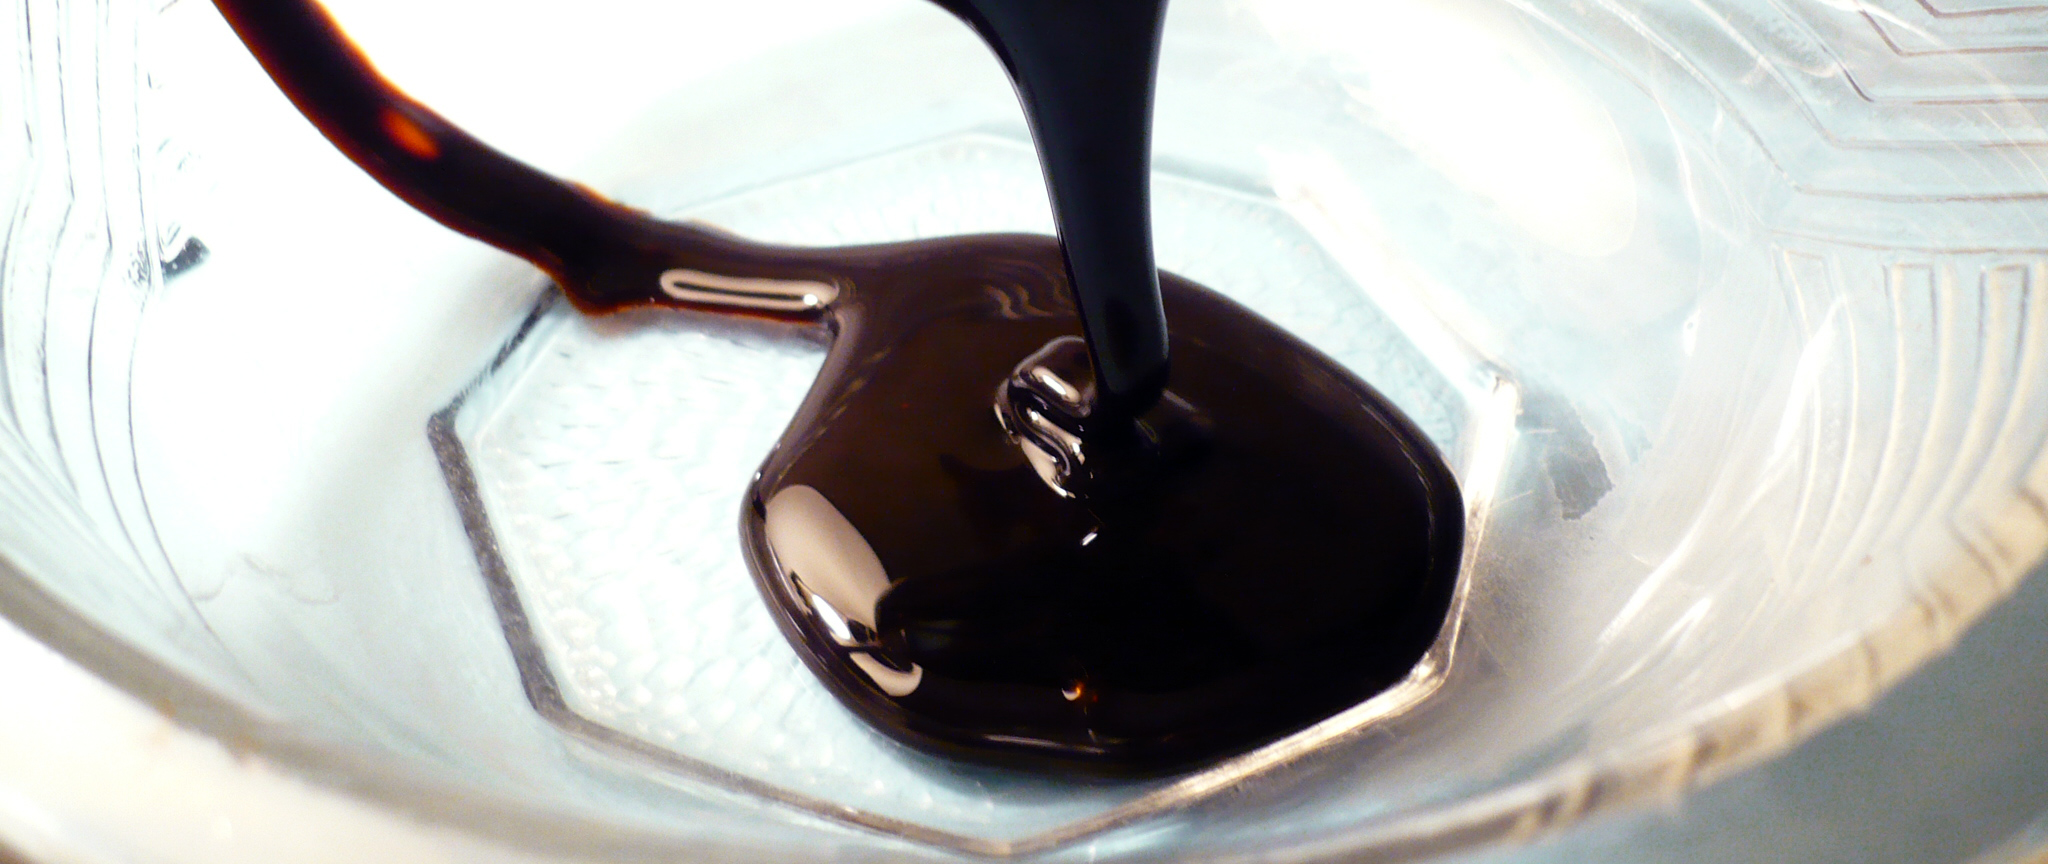 molasses 2 wikipedia free picturev2.jpg